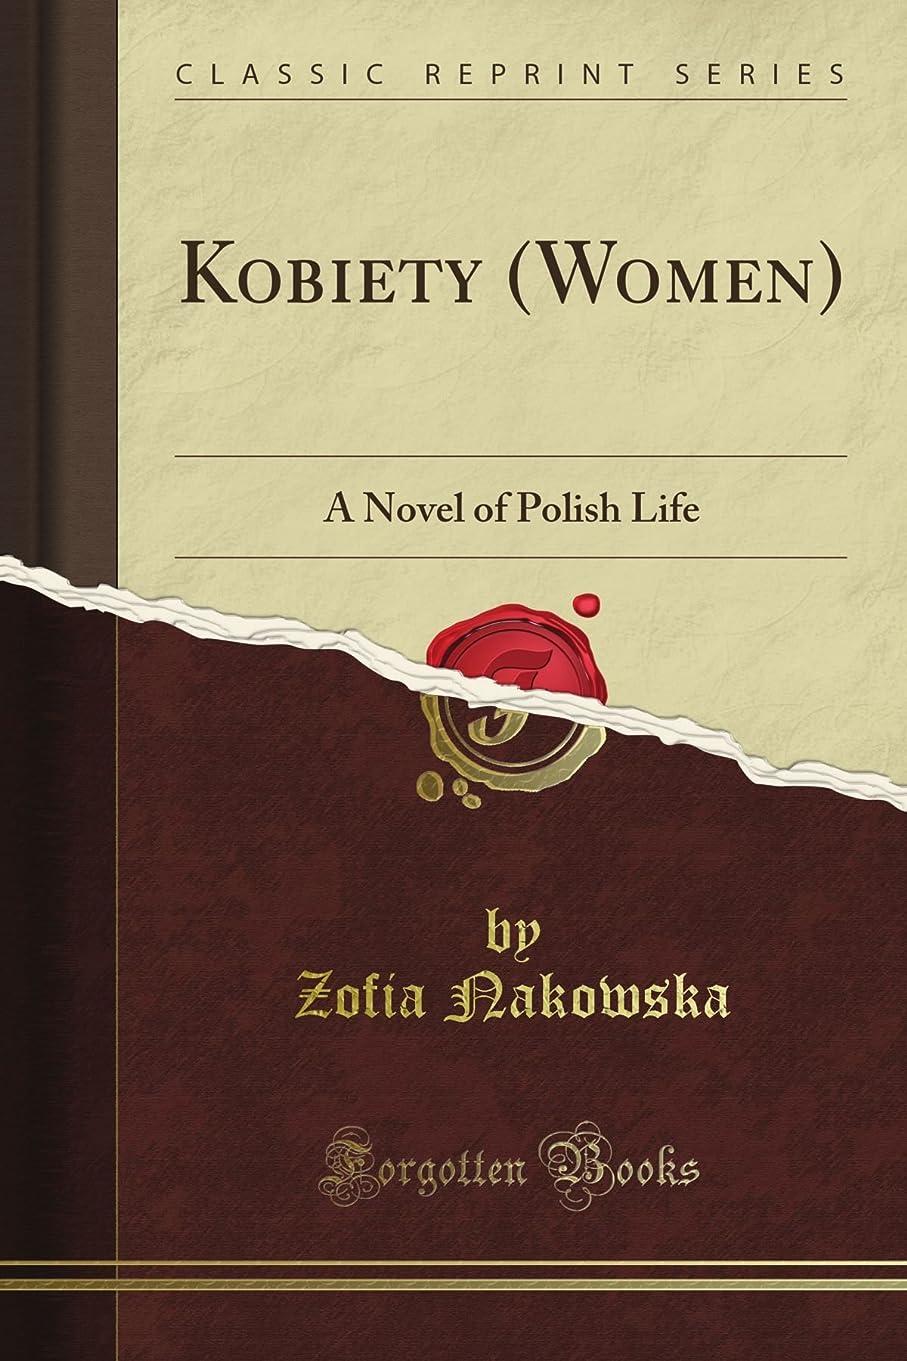 終点意味文庫本Kobiety (Women): A Novel of Polish Life (Classic Reprint)